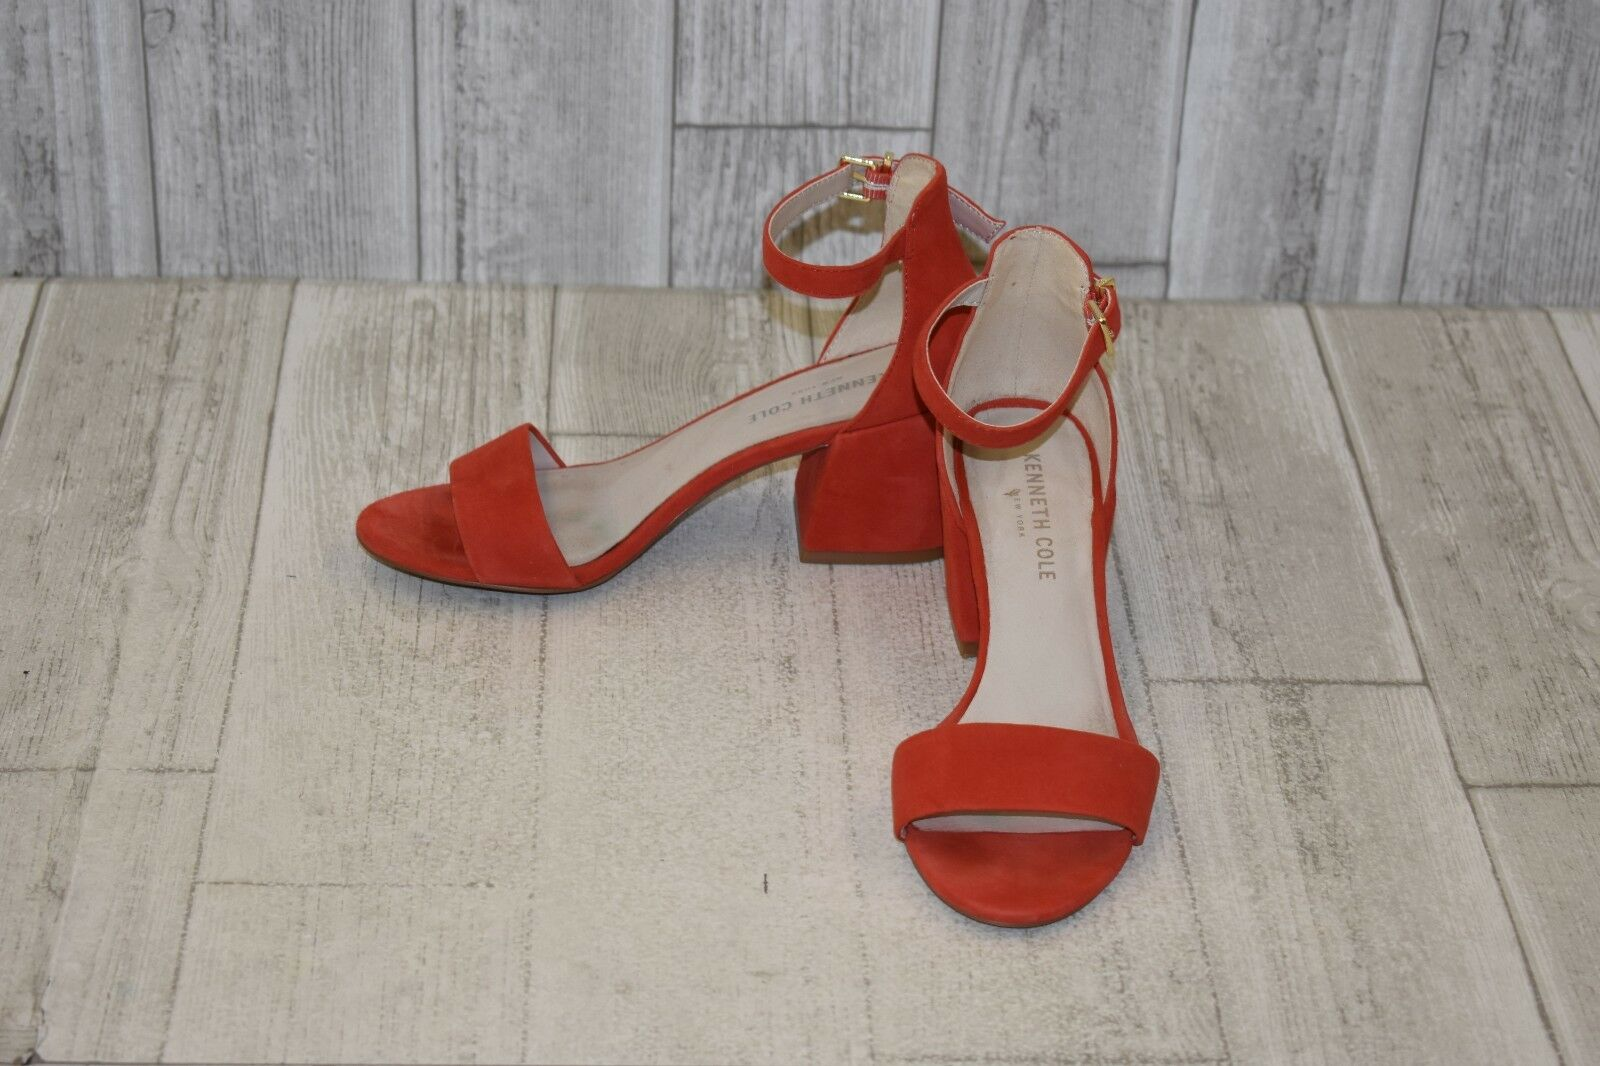 Kenneth Cole Hannon Suede Block Heel Sandals, Women's Size 6.5M, Persimmon